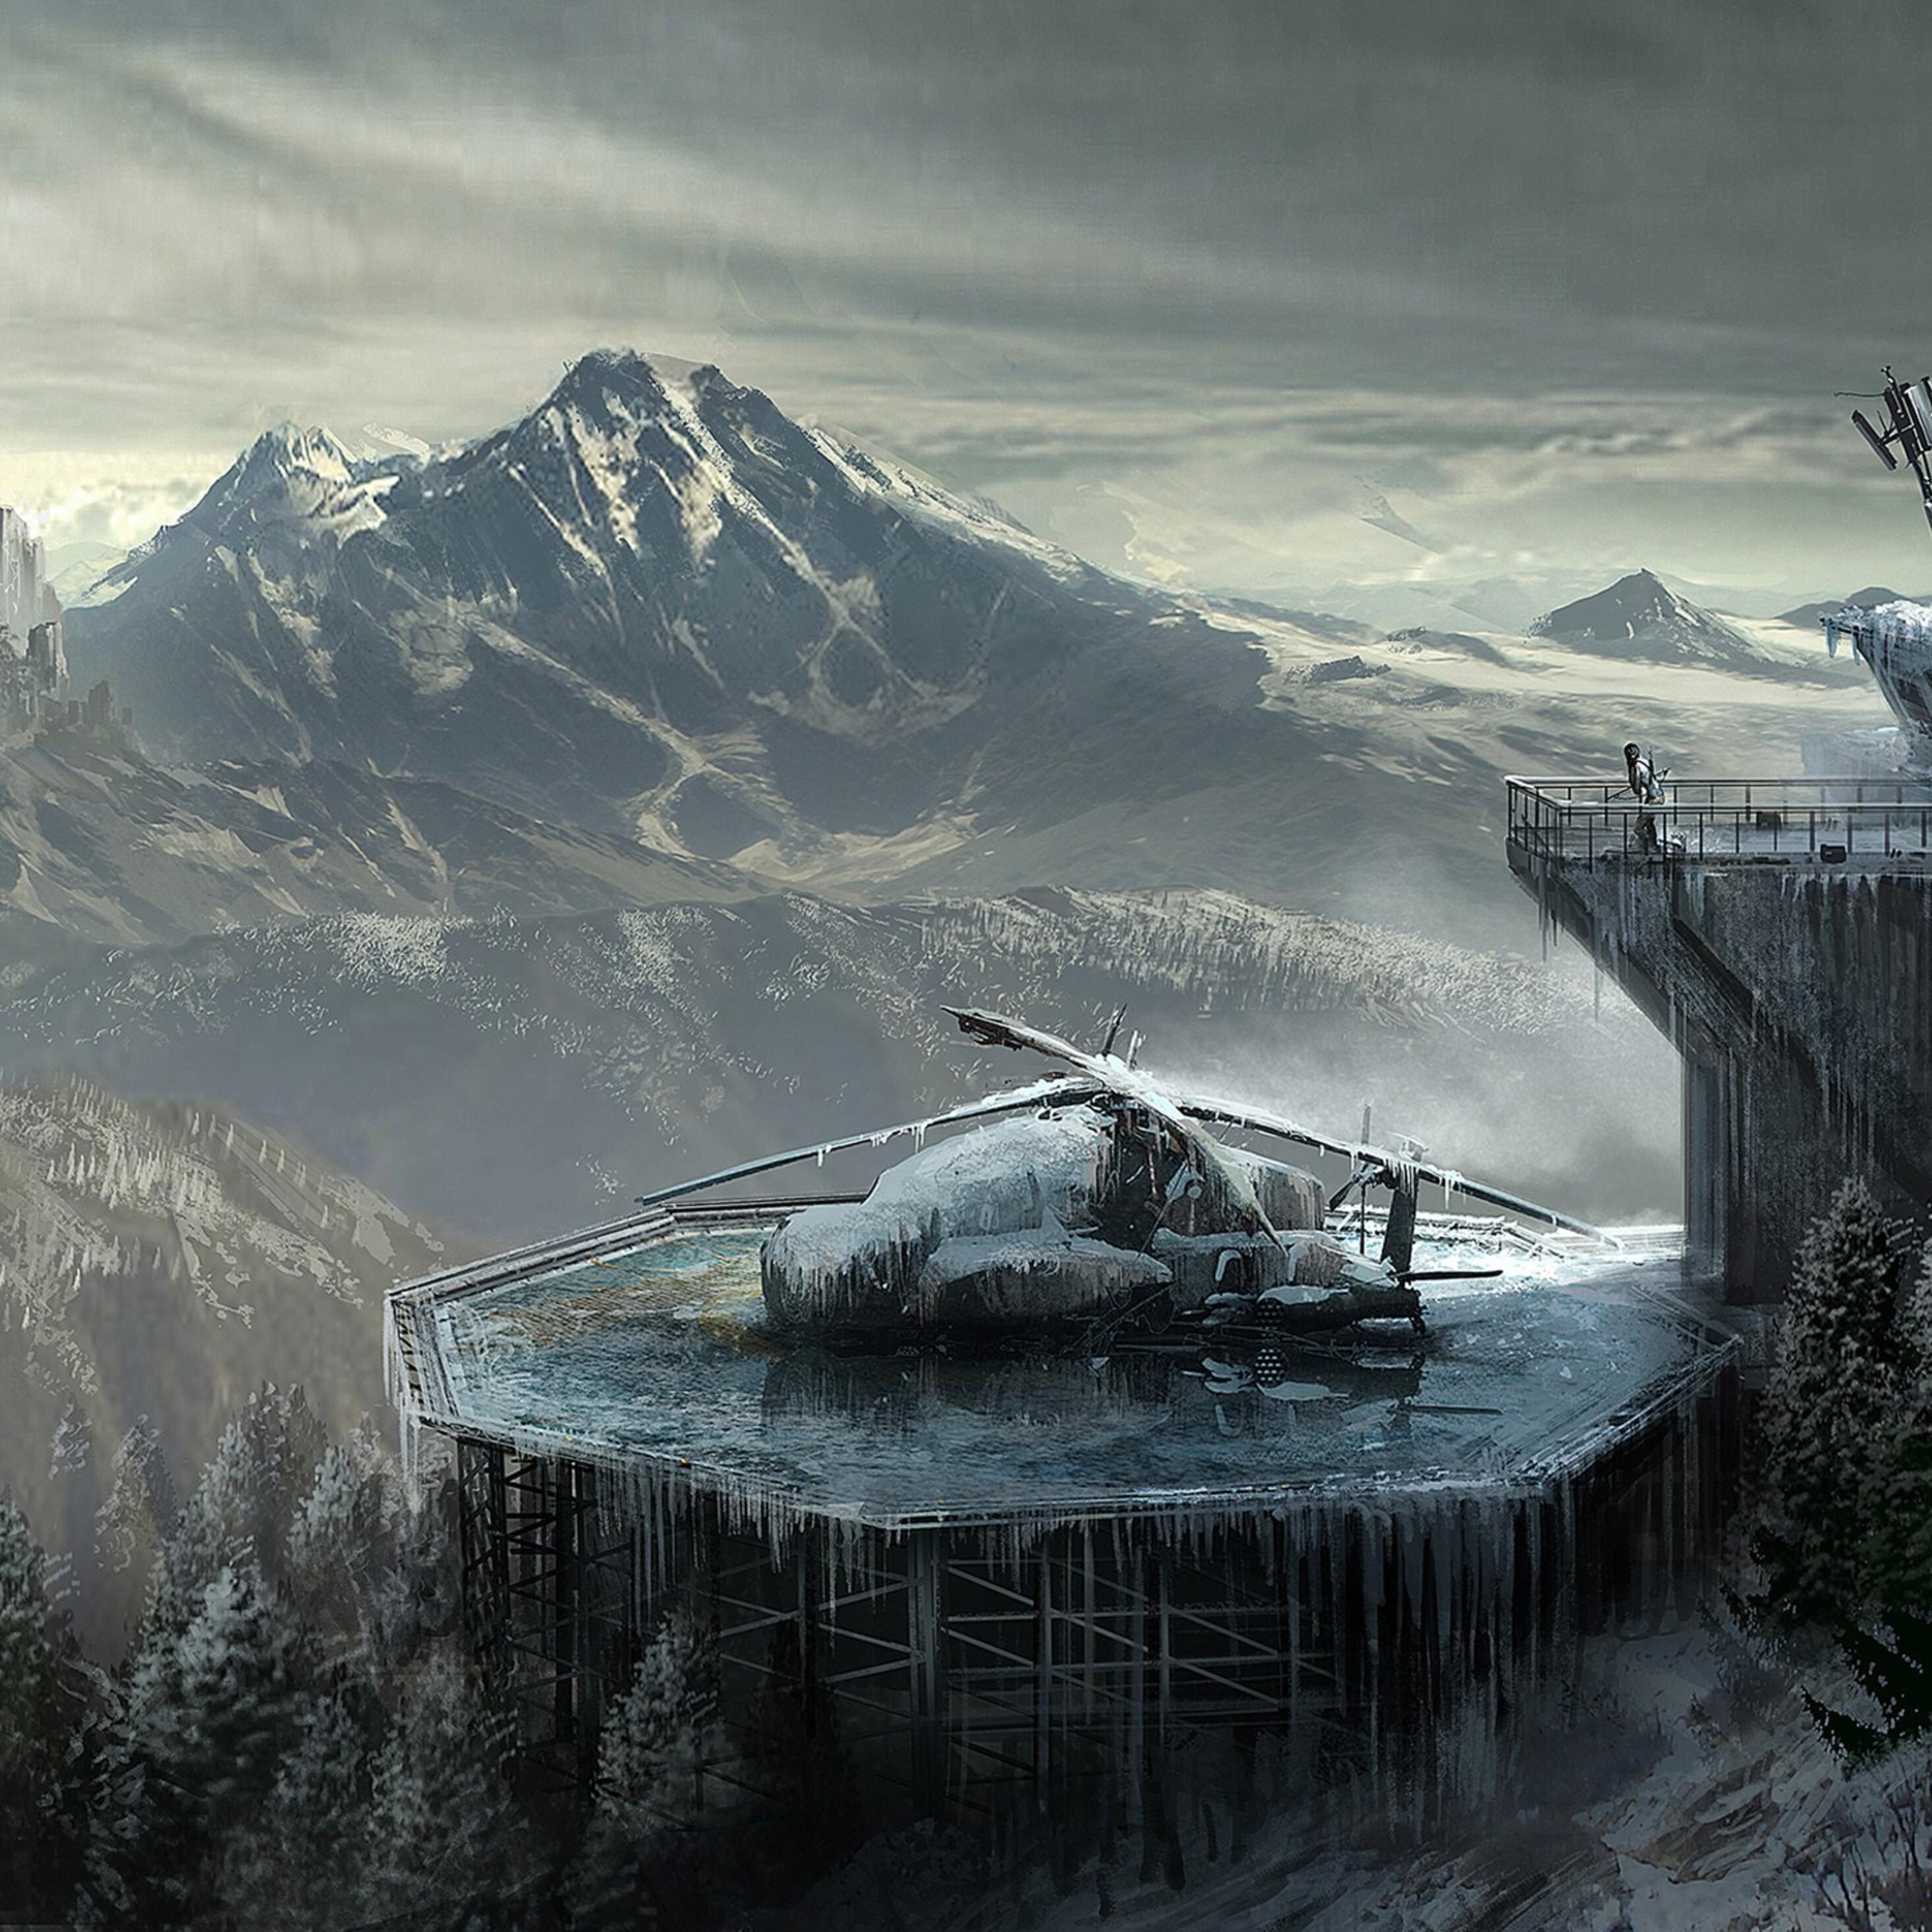 Rise Of The Tomb Raider 2015 4k Hd Desktop Wallpaper For: 2932x2932 Rise Of The Tomb Raider Concept Art Ipad Pro